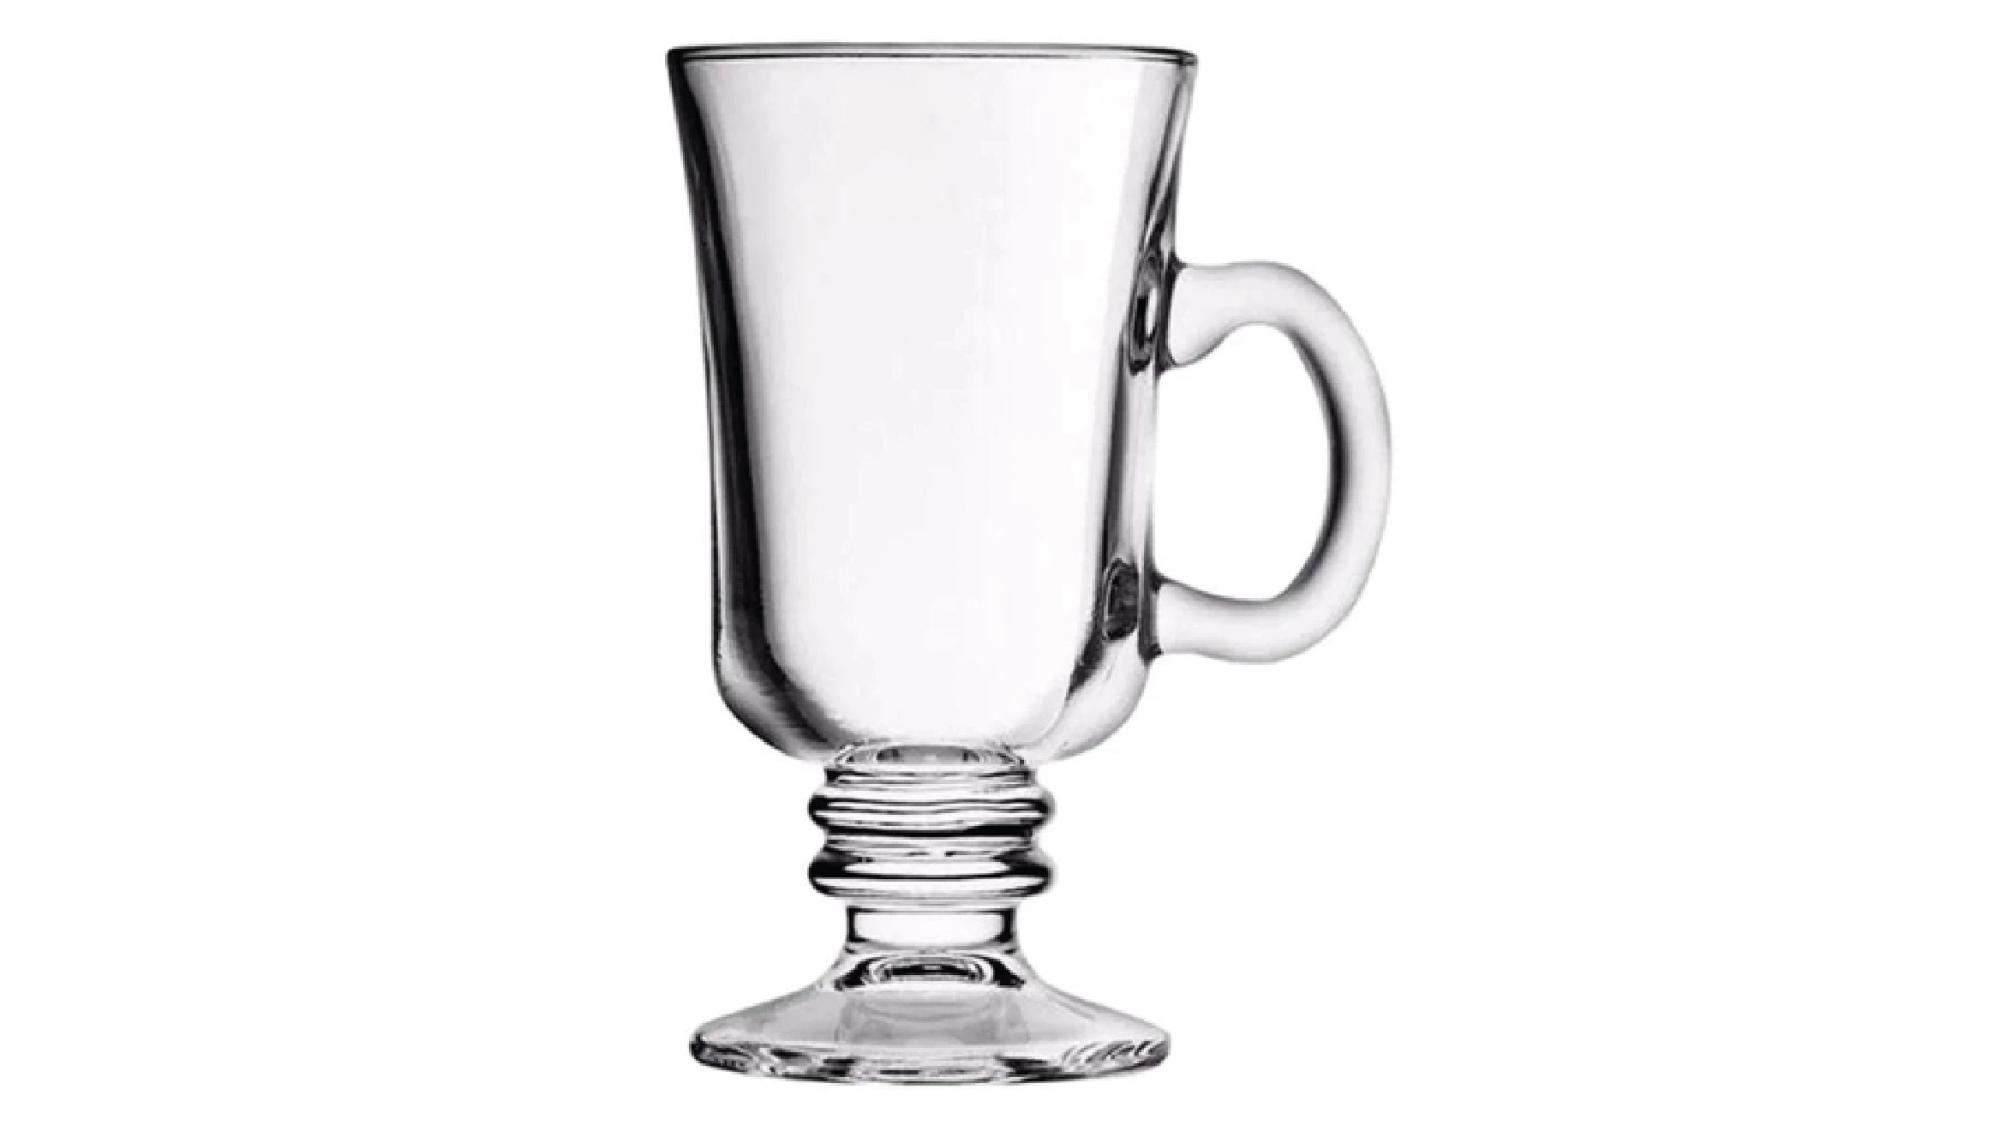 CANECA IRISH COFFEE PAVILLINO BRINOX 240ML 57716/003